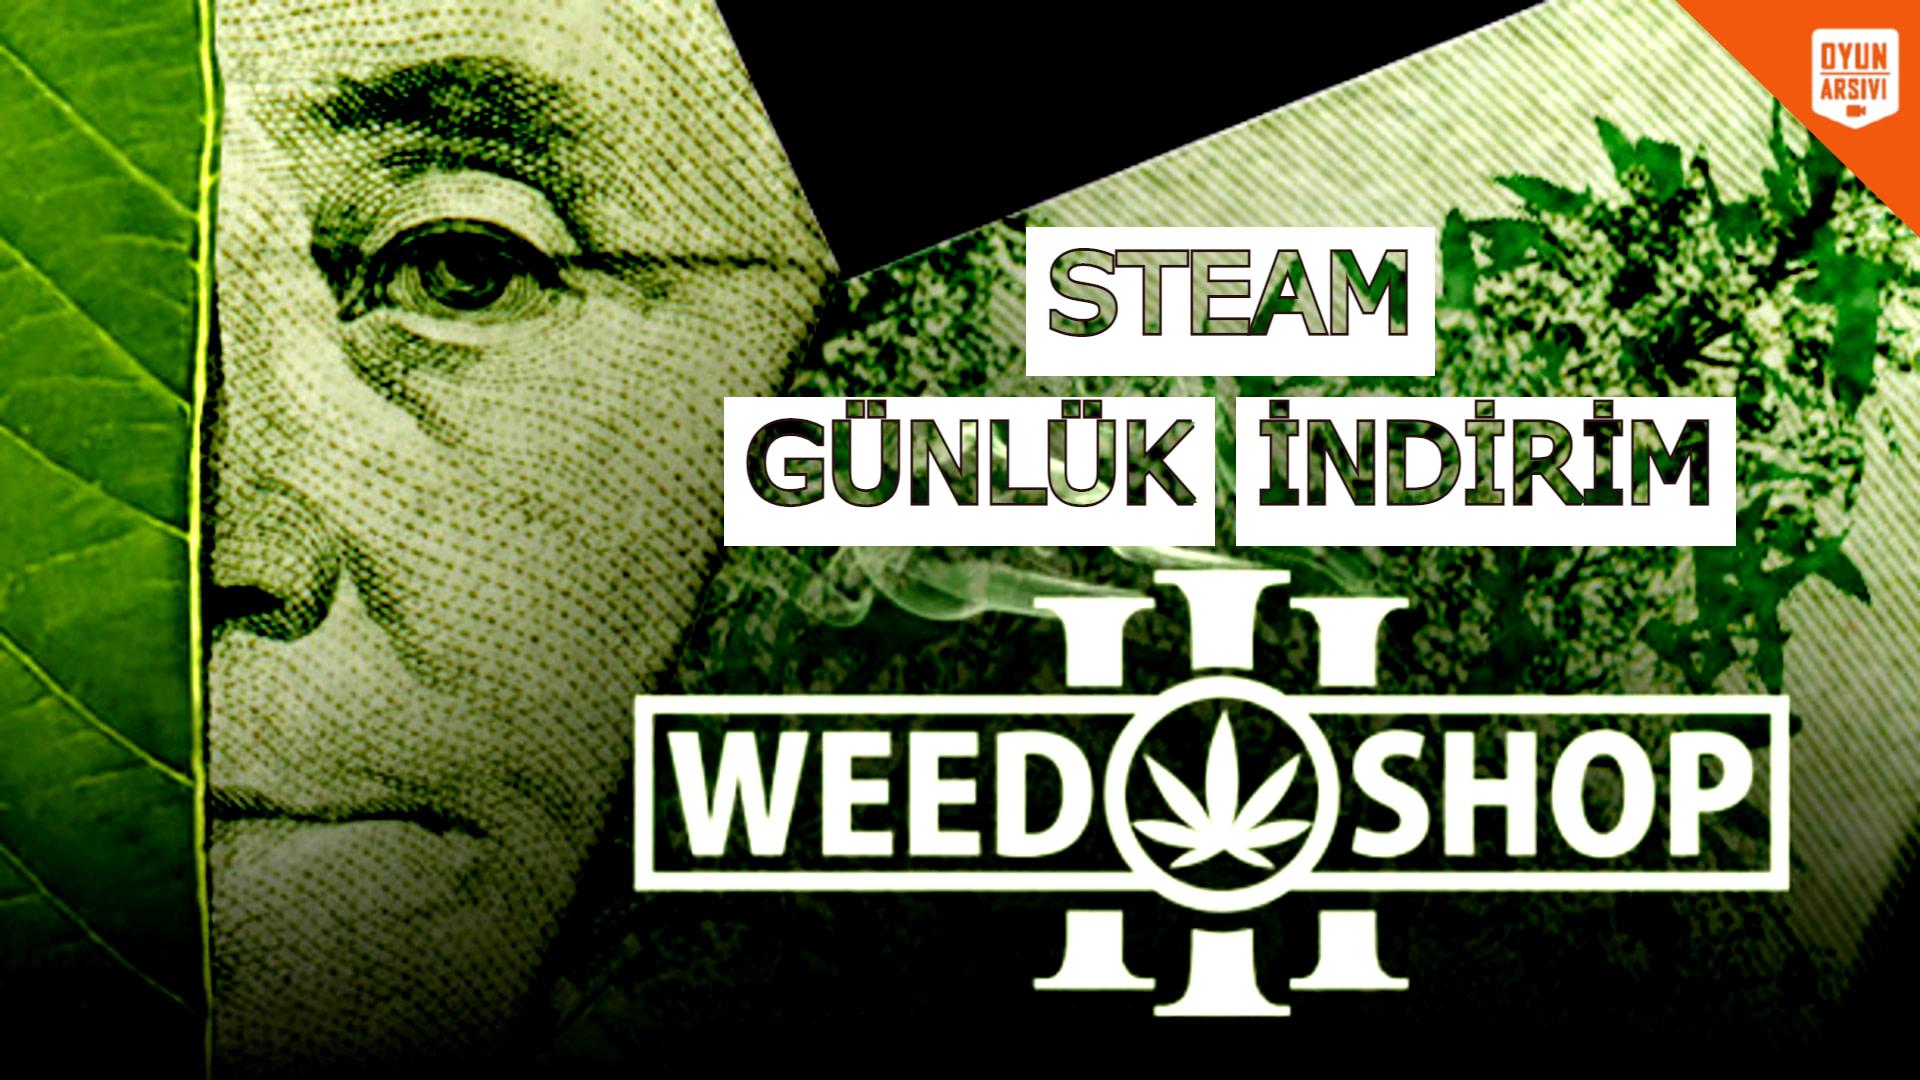 WEED SHOP 3 OYUN ARŞİVİ